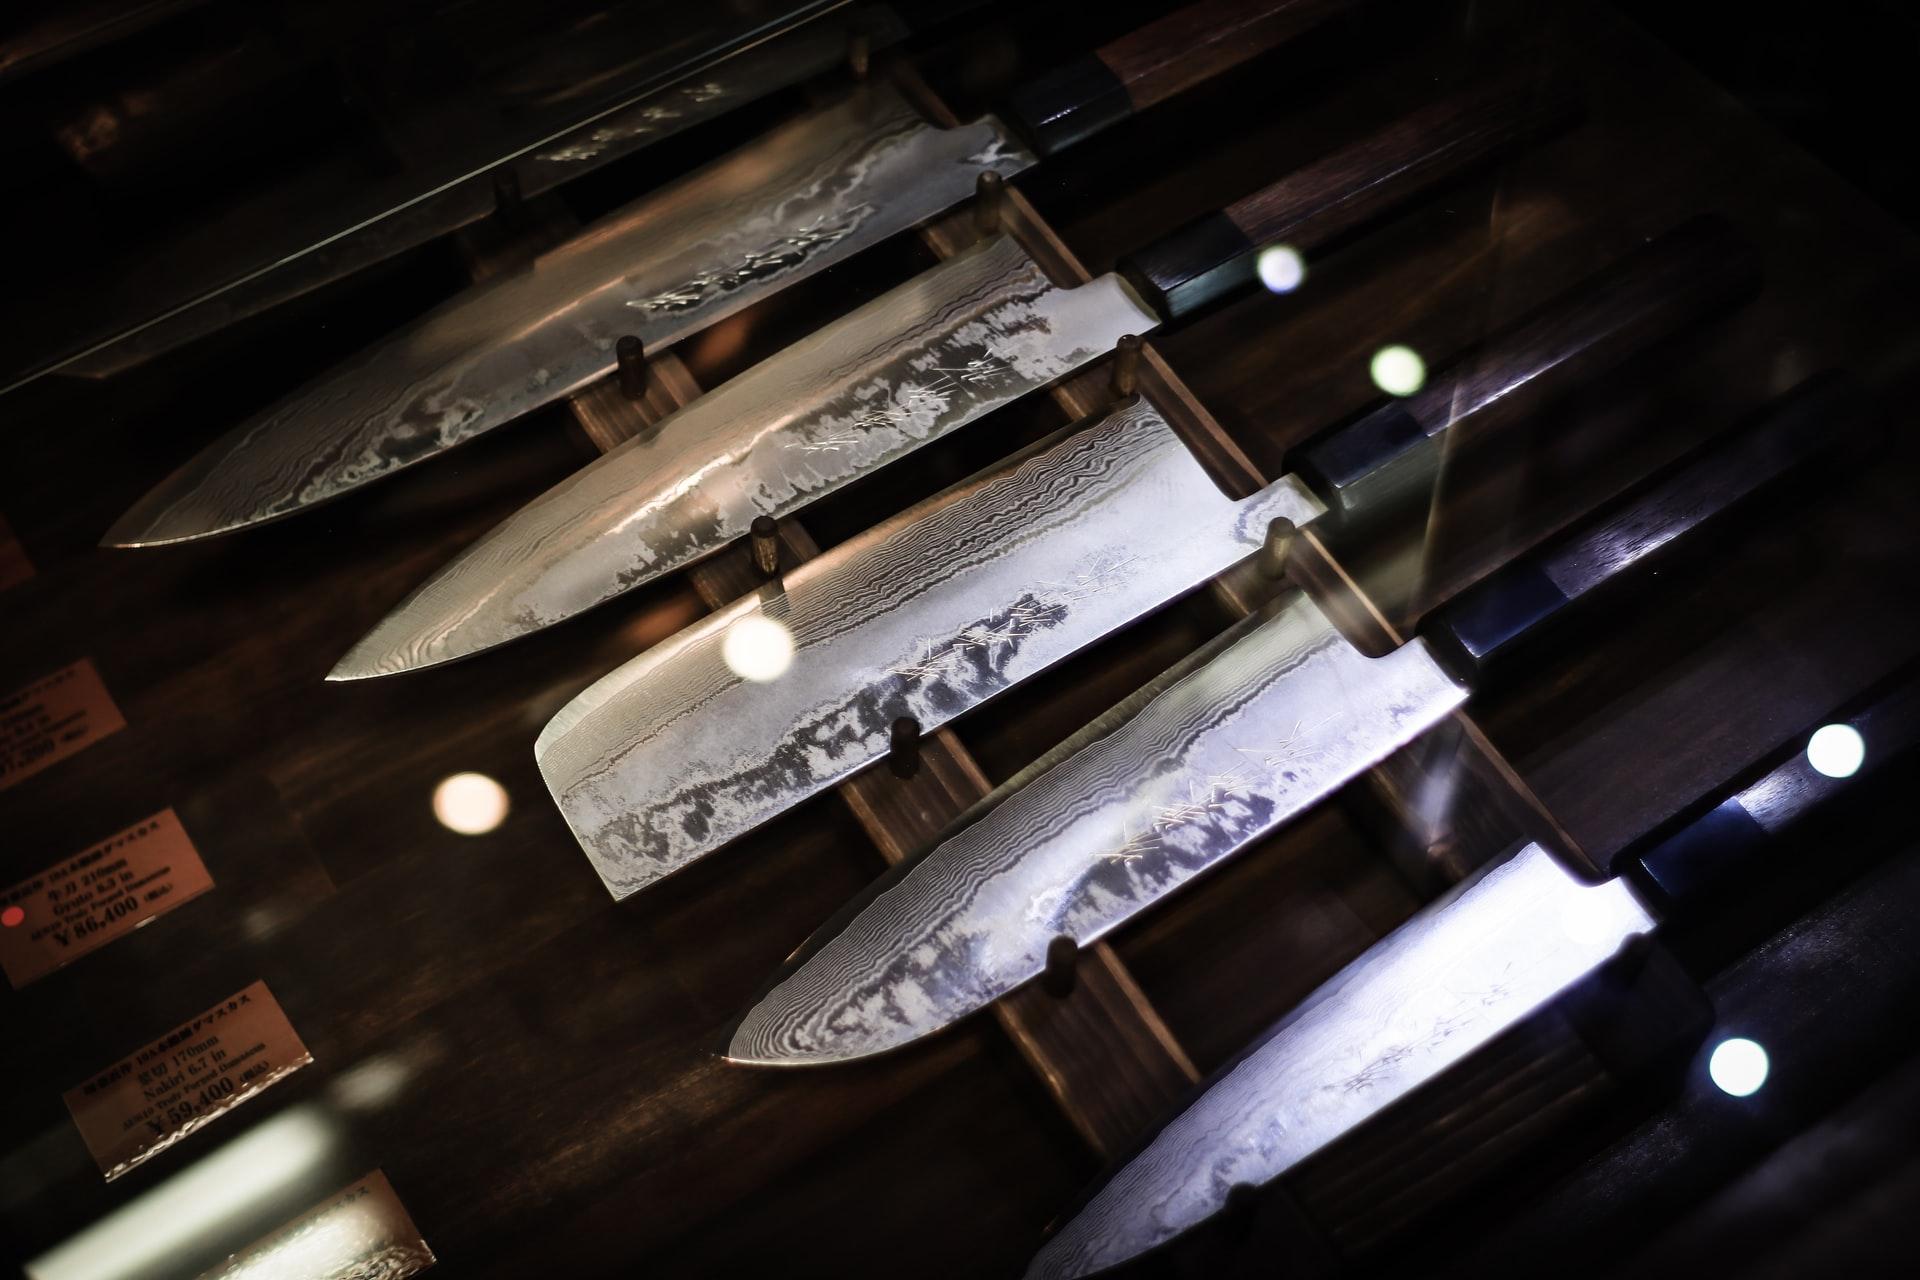 juegos de cuchillo